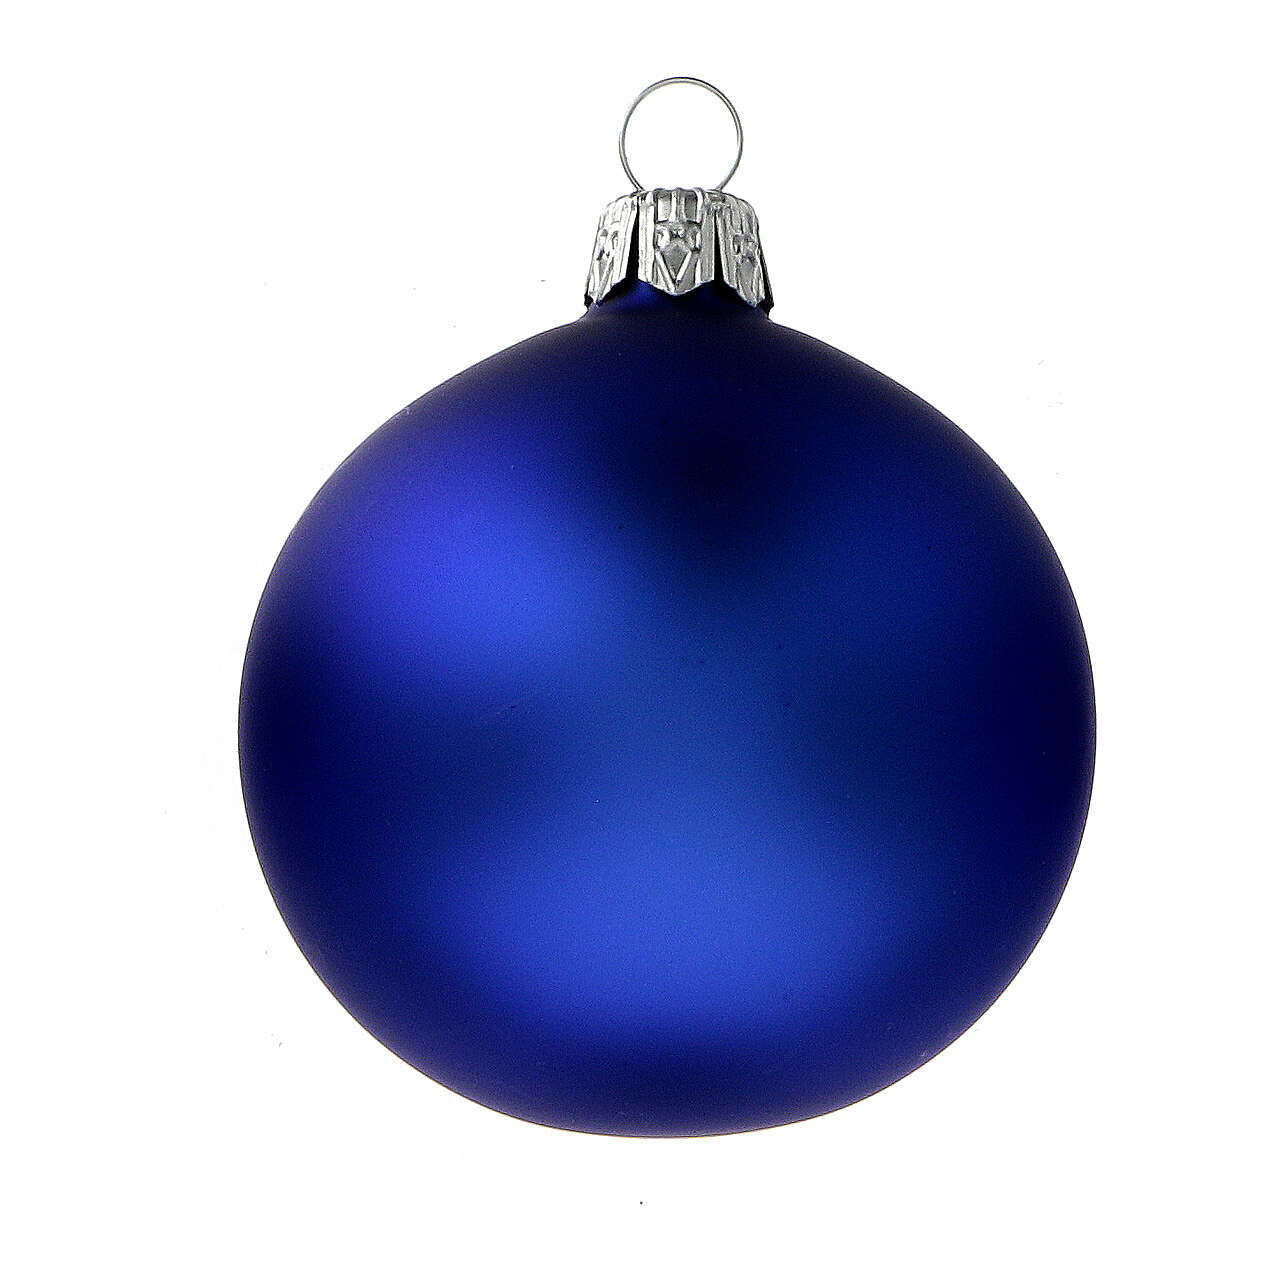 Palline natalizie albero blu opaco vetro soffiato 60 mm 6 pz 4